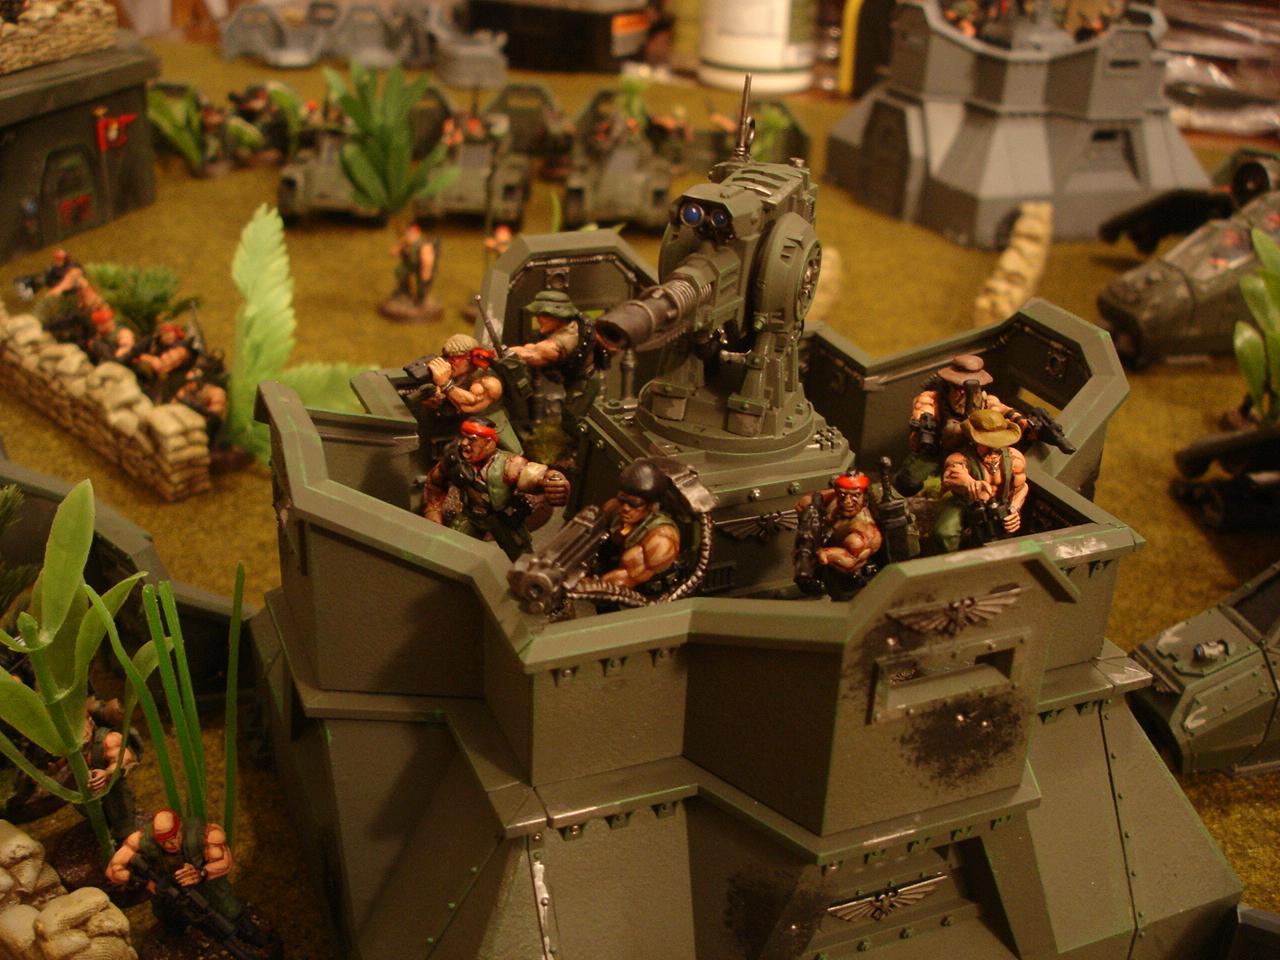 Bastion, Catachan, Imperial Guard, Planetstrike, Warhammer 40,000, Warhammer Fantasy